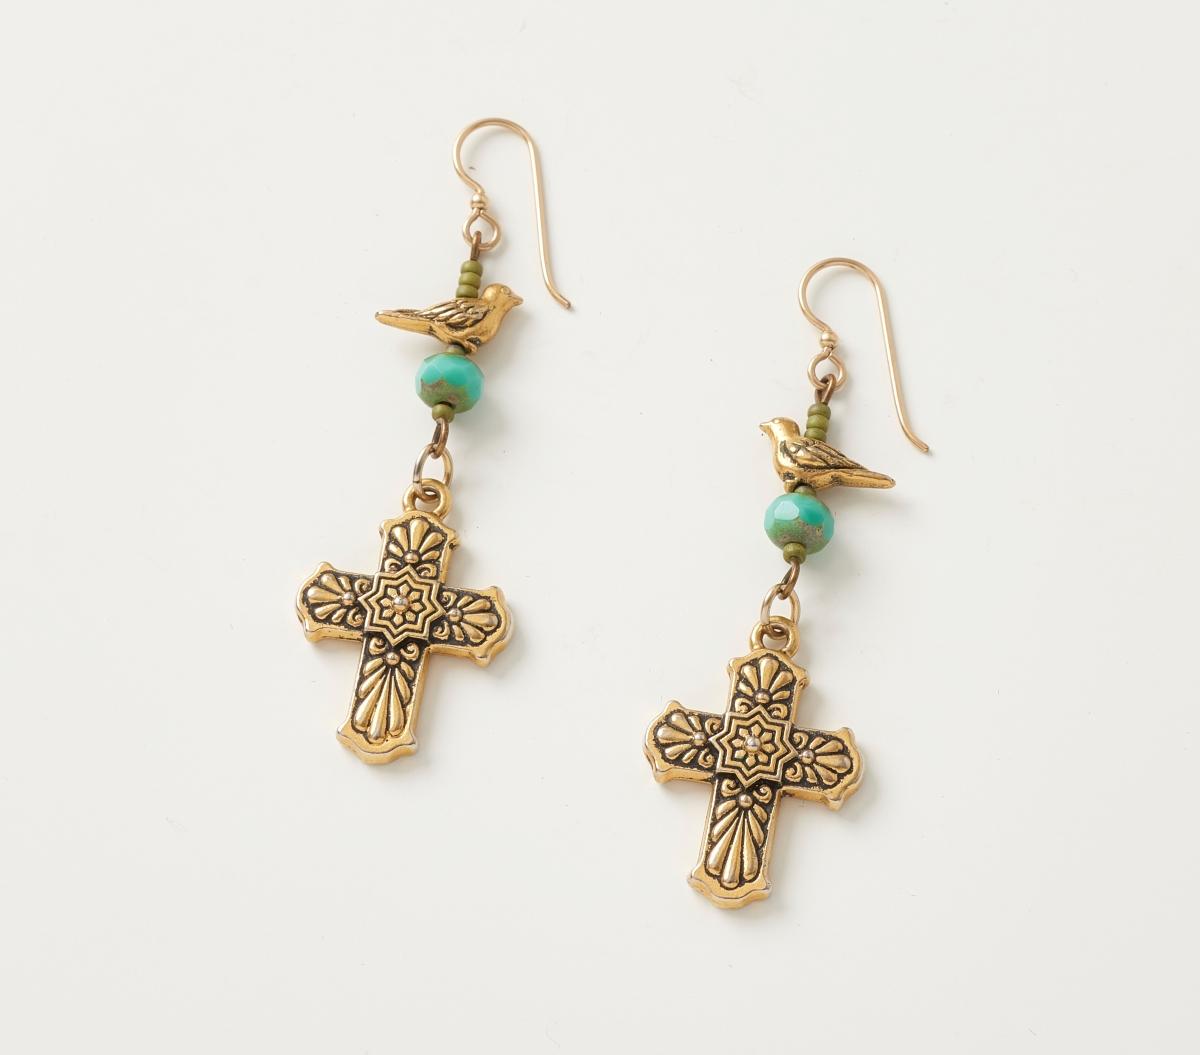 talavera-dove-earrings.jpg